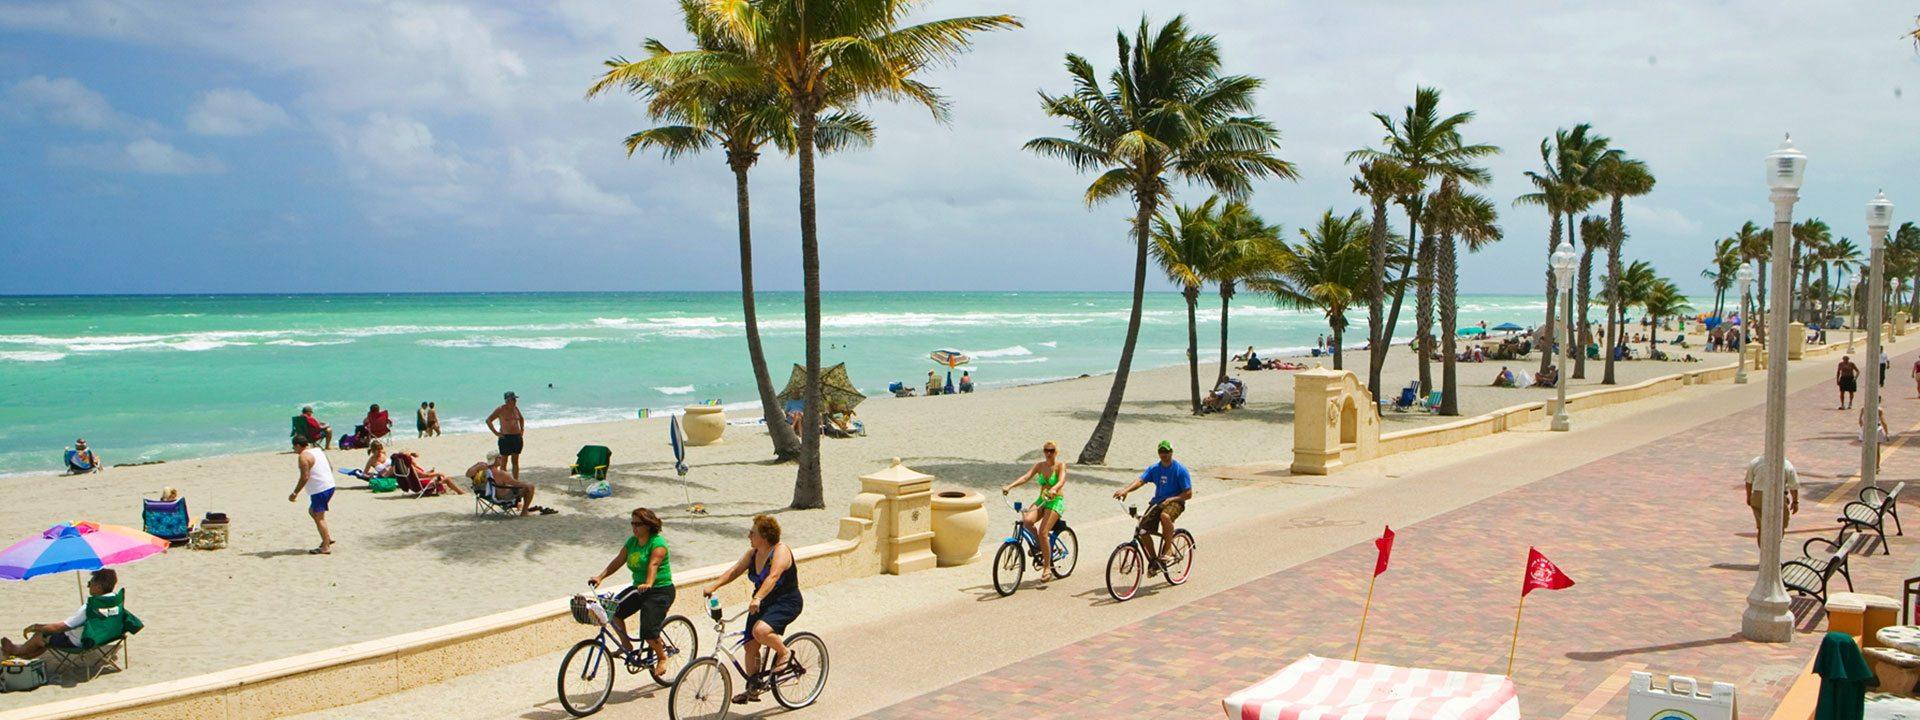 Miami Beach Promendae